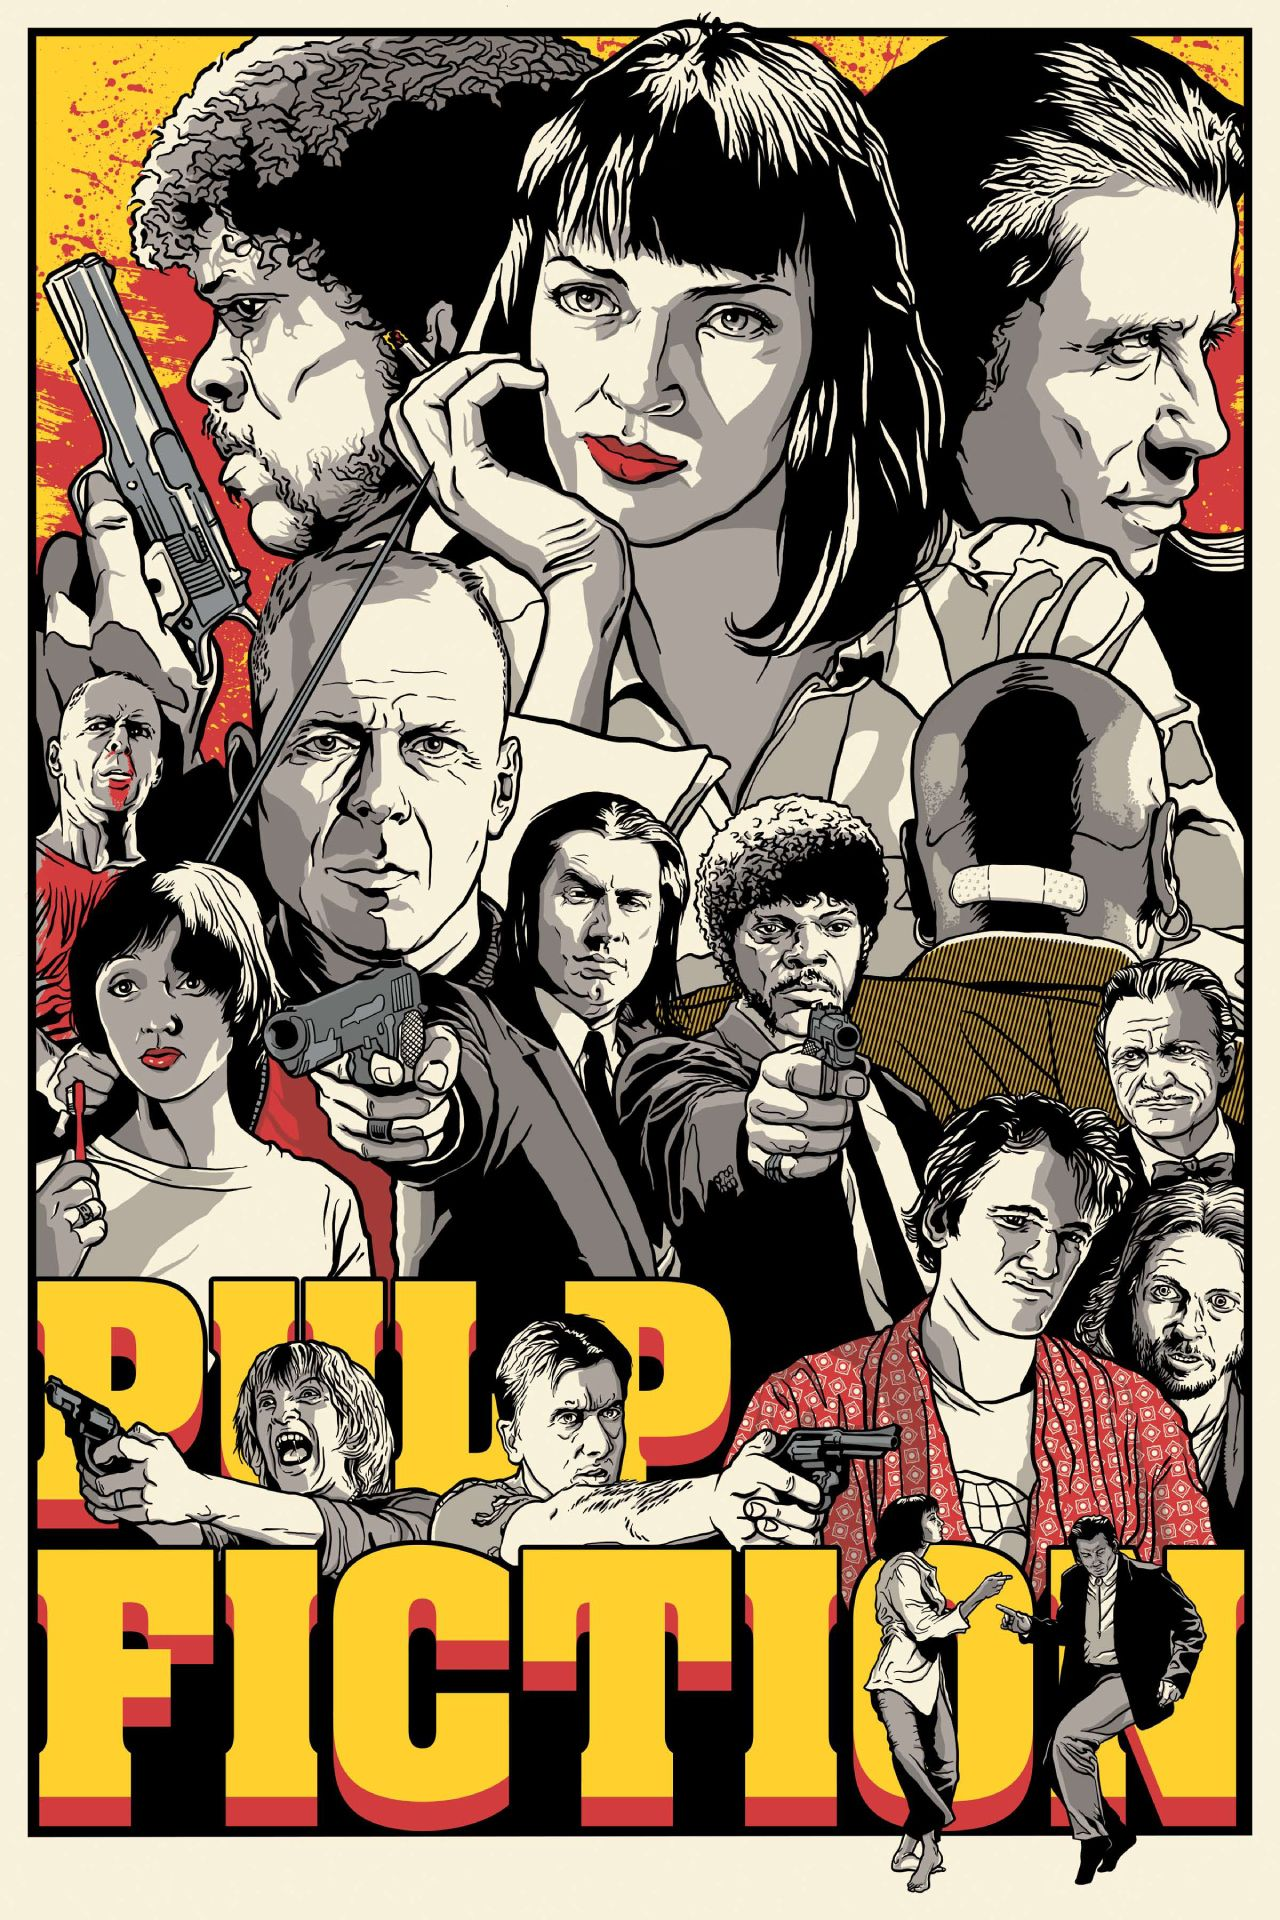 Best 25 pulp fiction cast ideas on pinterest pulp fiction actors watch pulp fiction and pulp fiction book